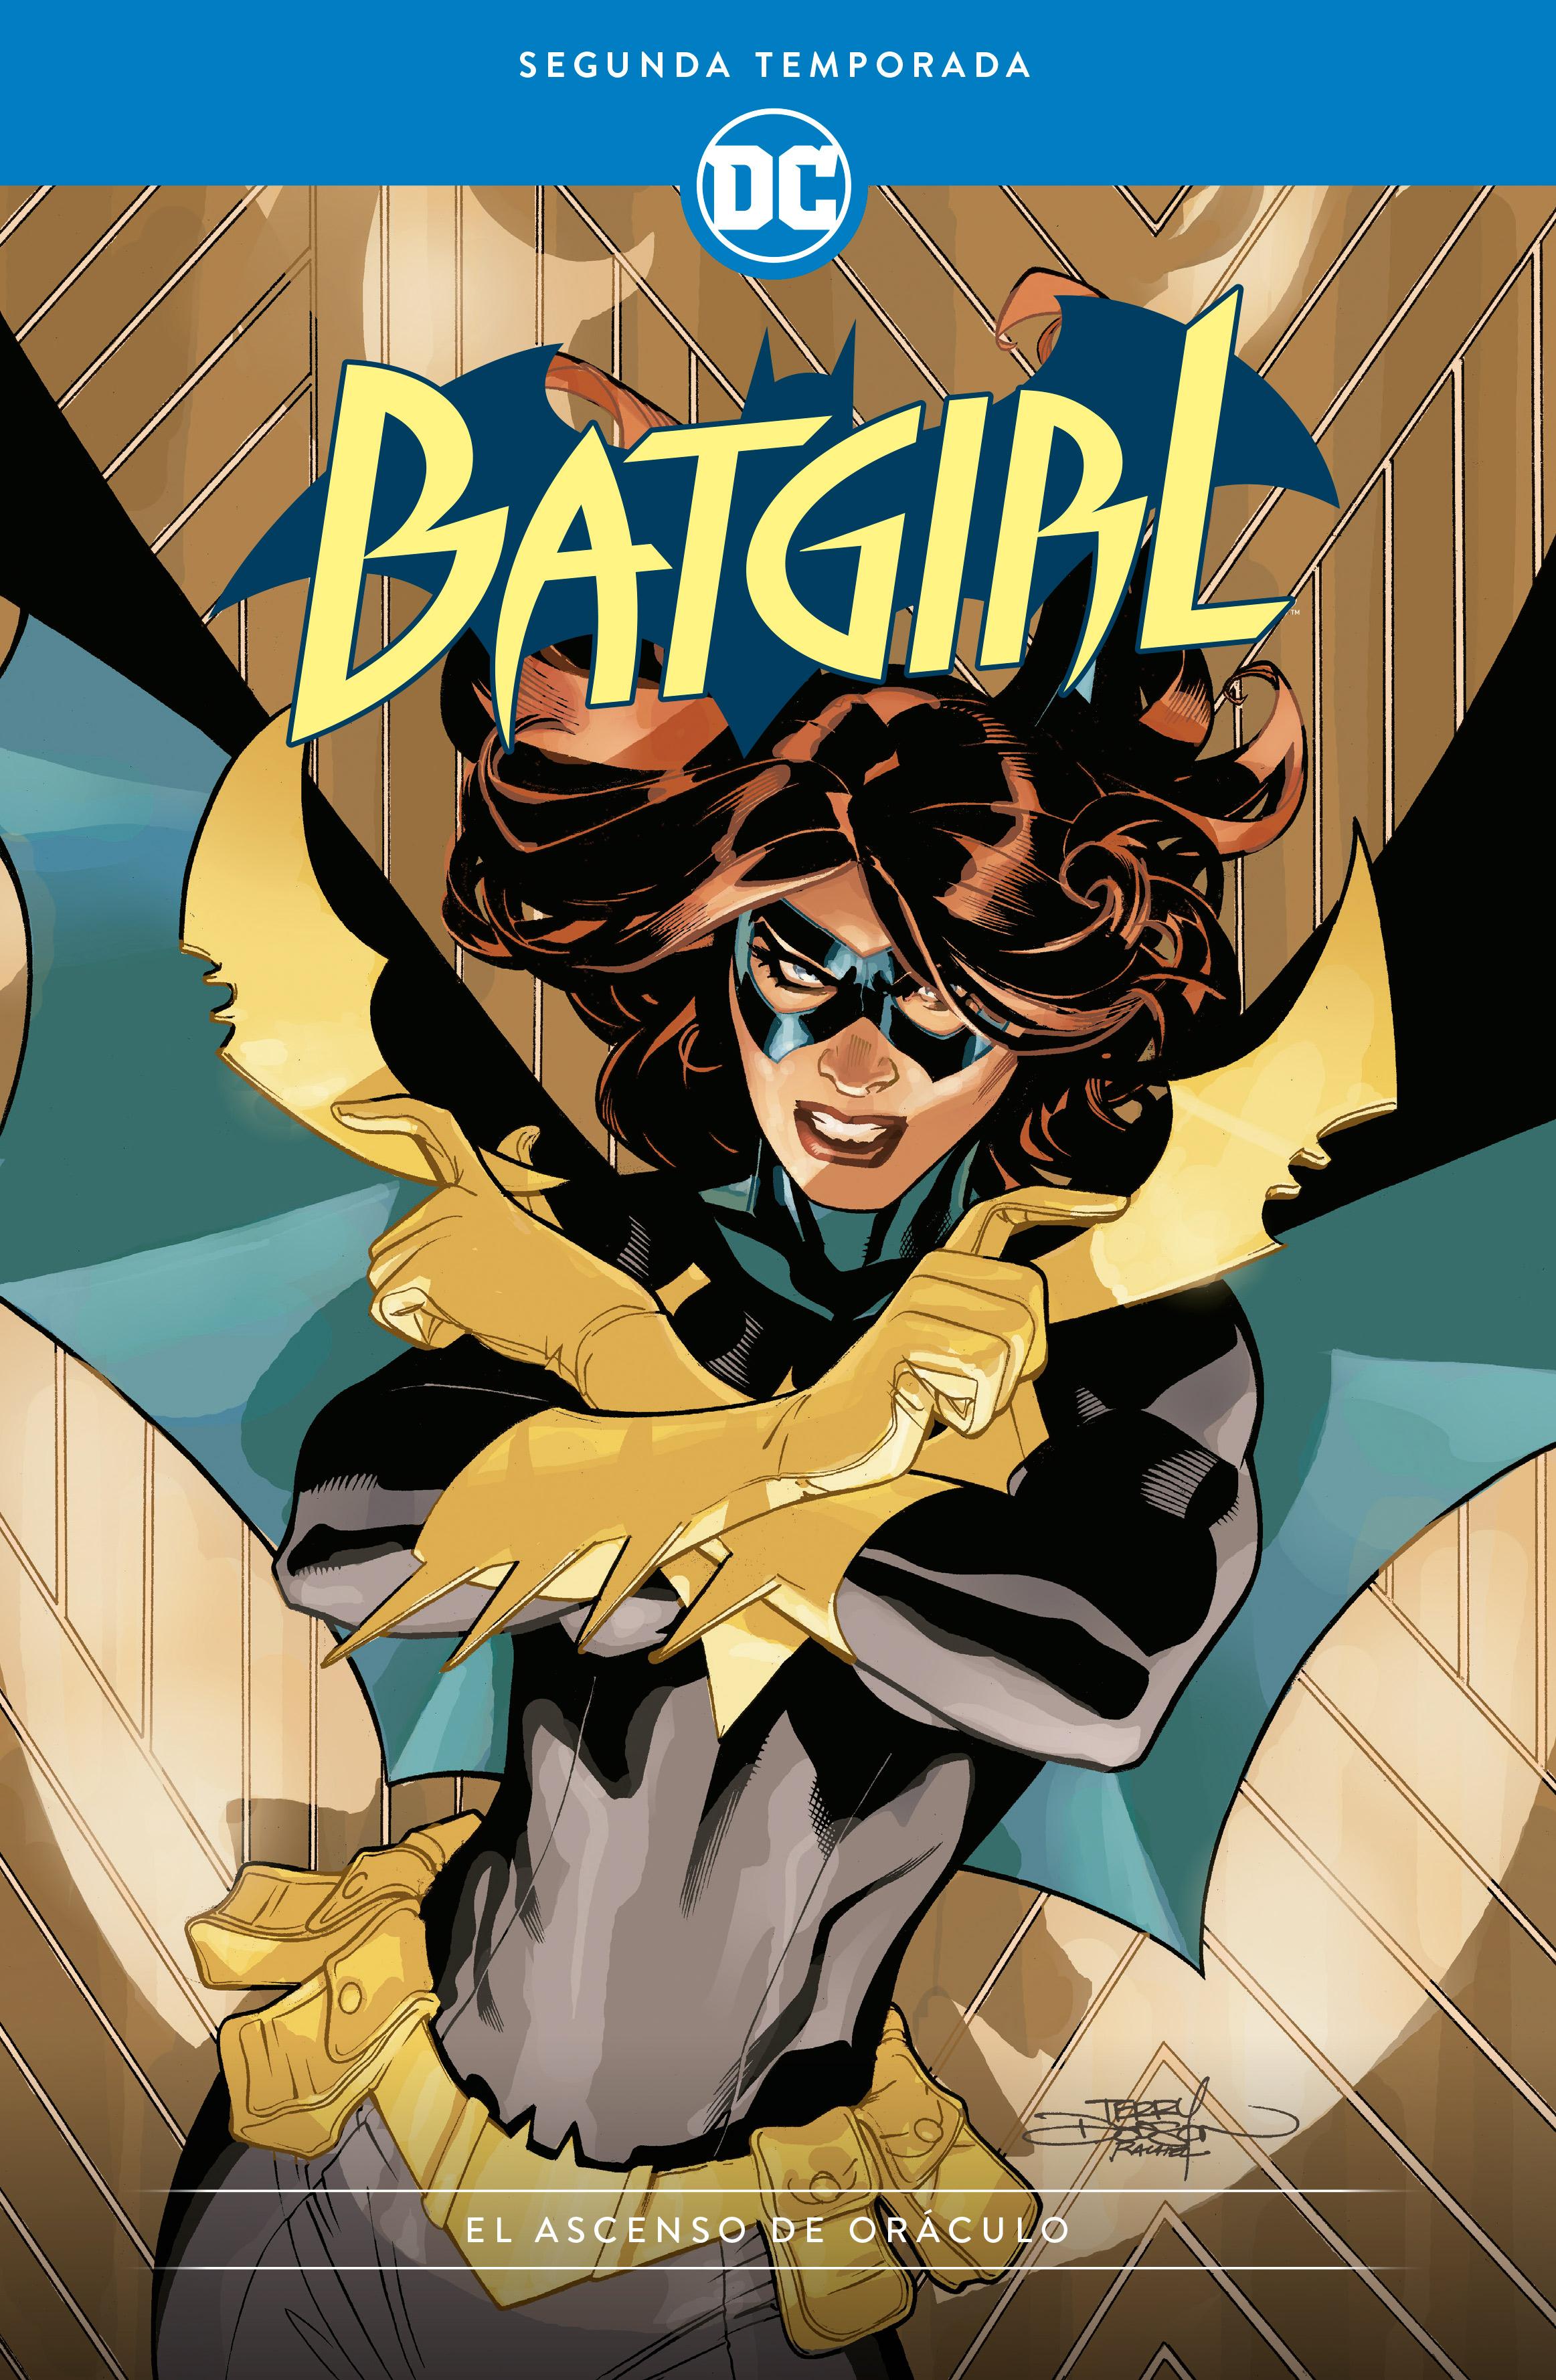 Batgirl - Segunda temporada: El ascenso de Oráculo